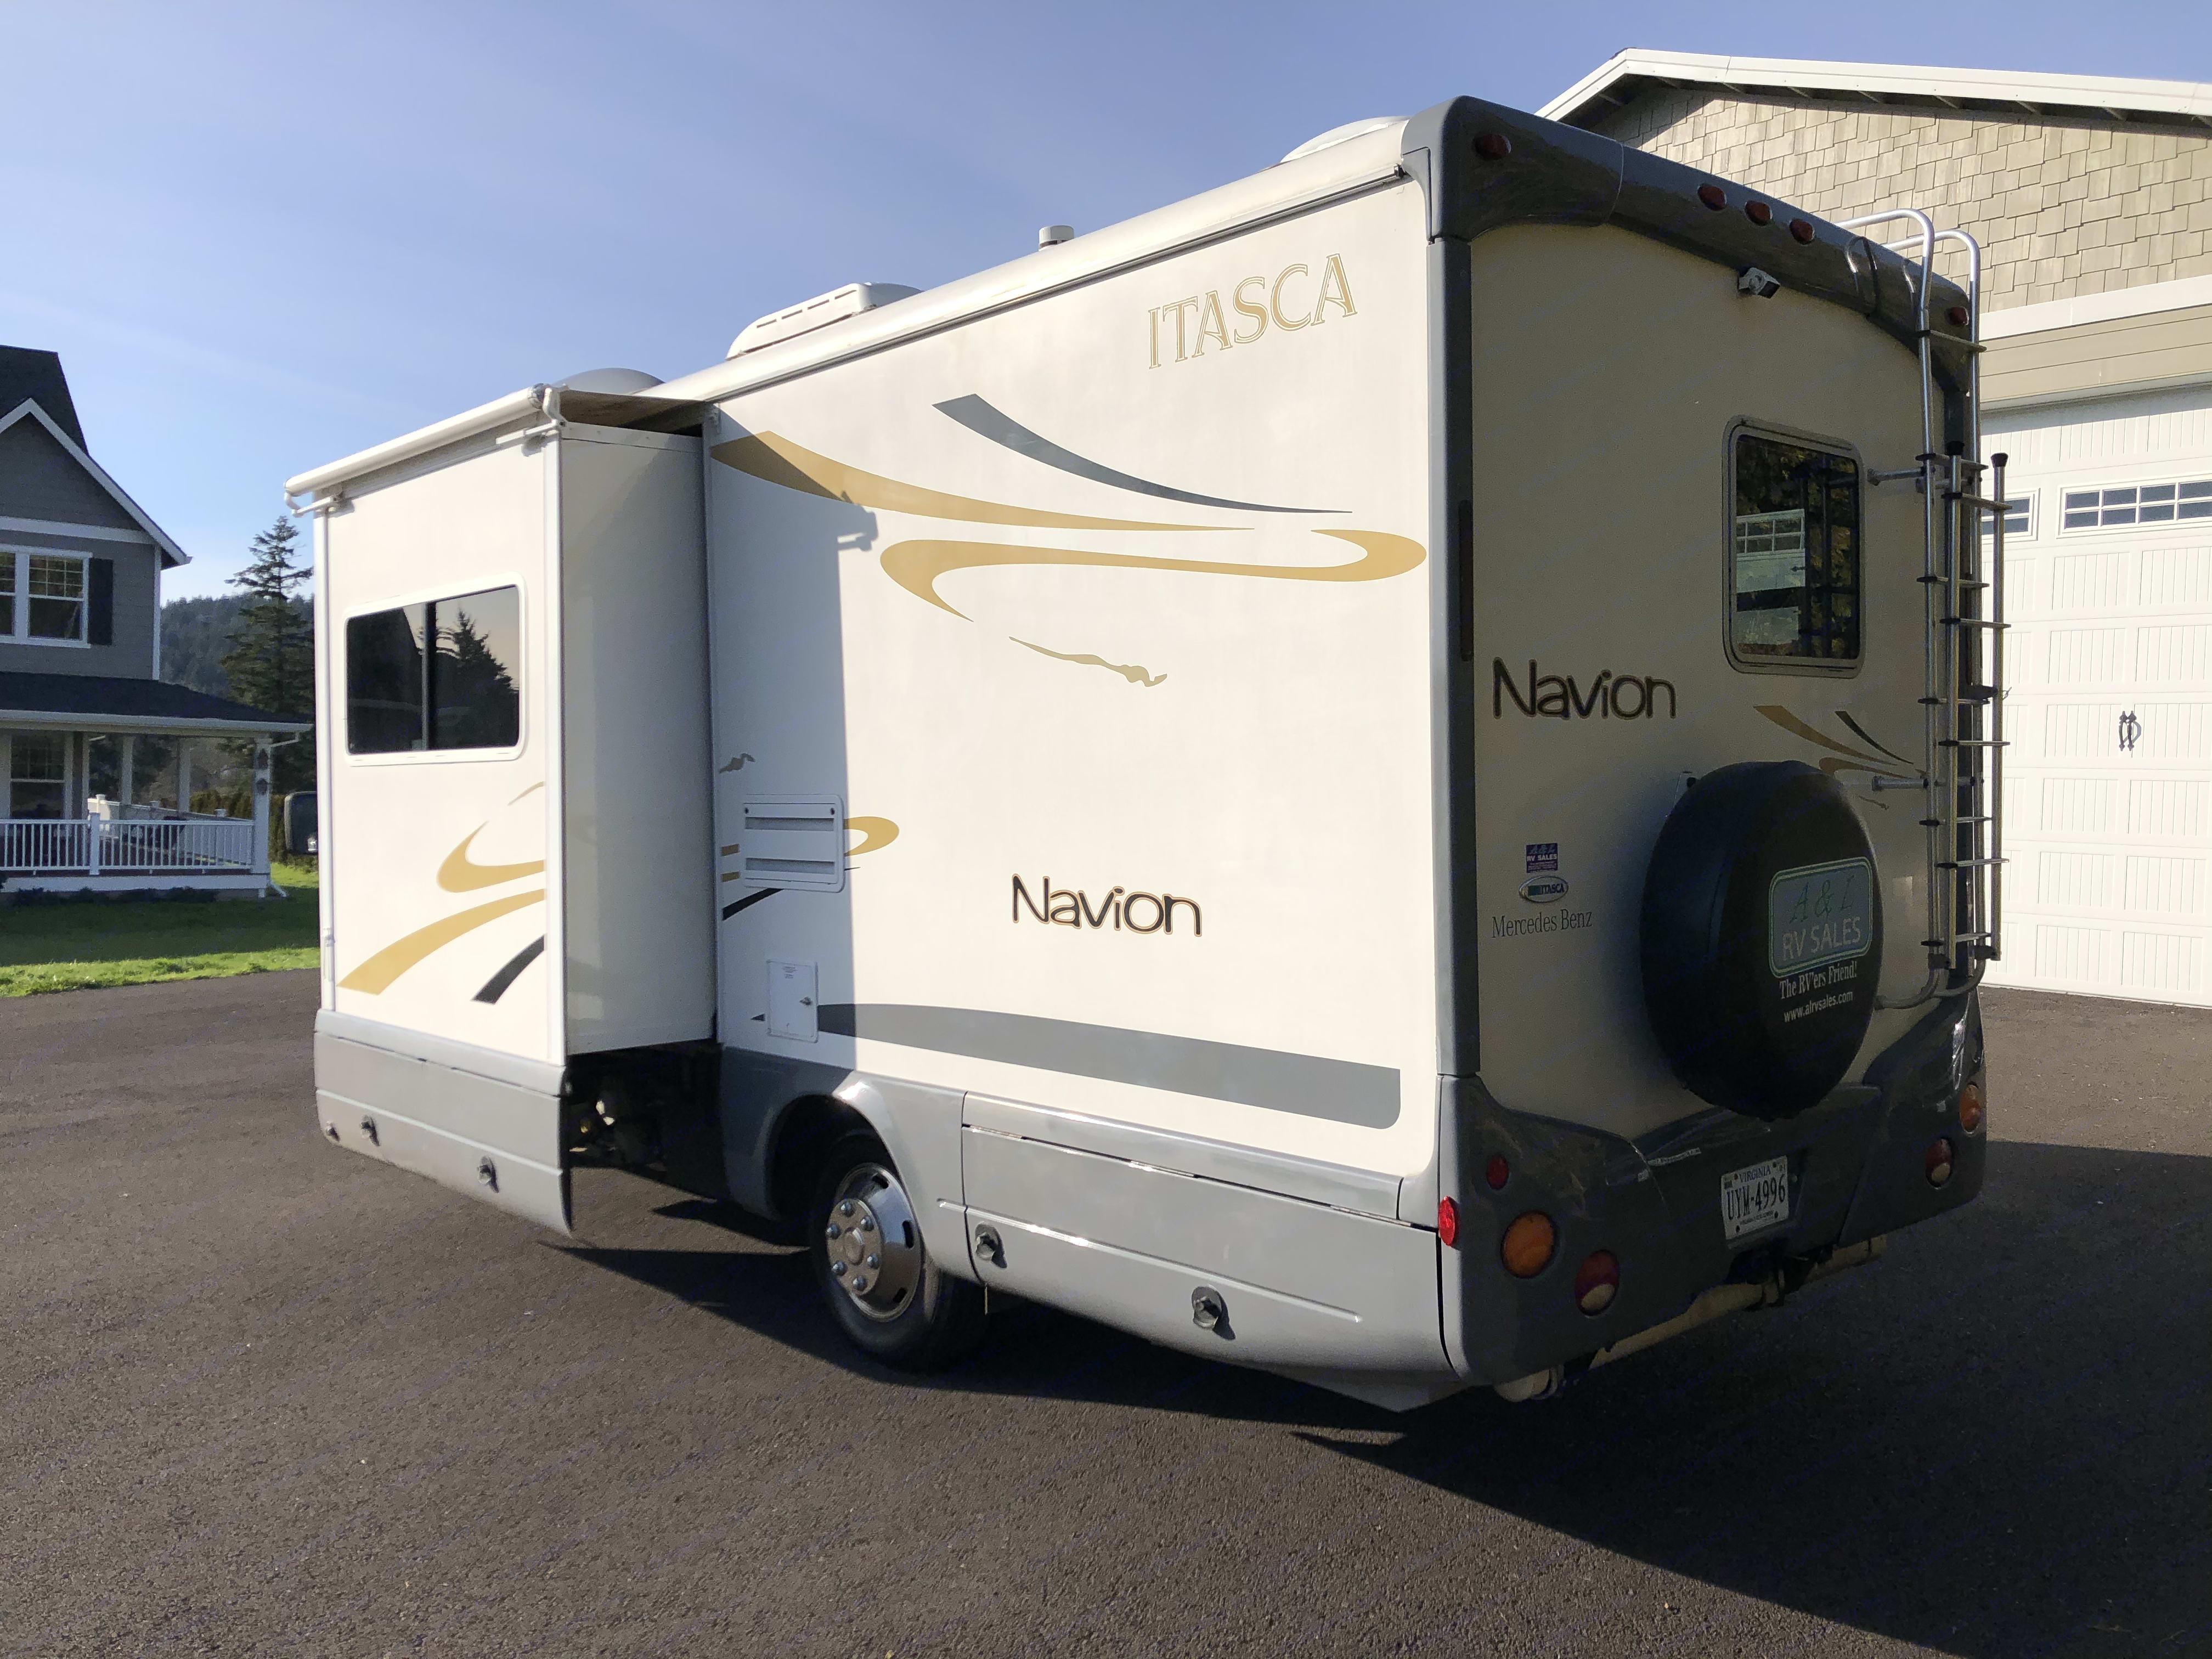 Itasca Navion 2007